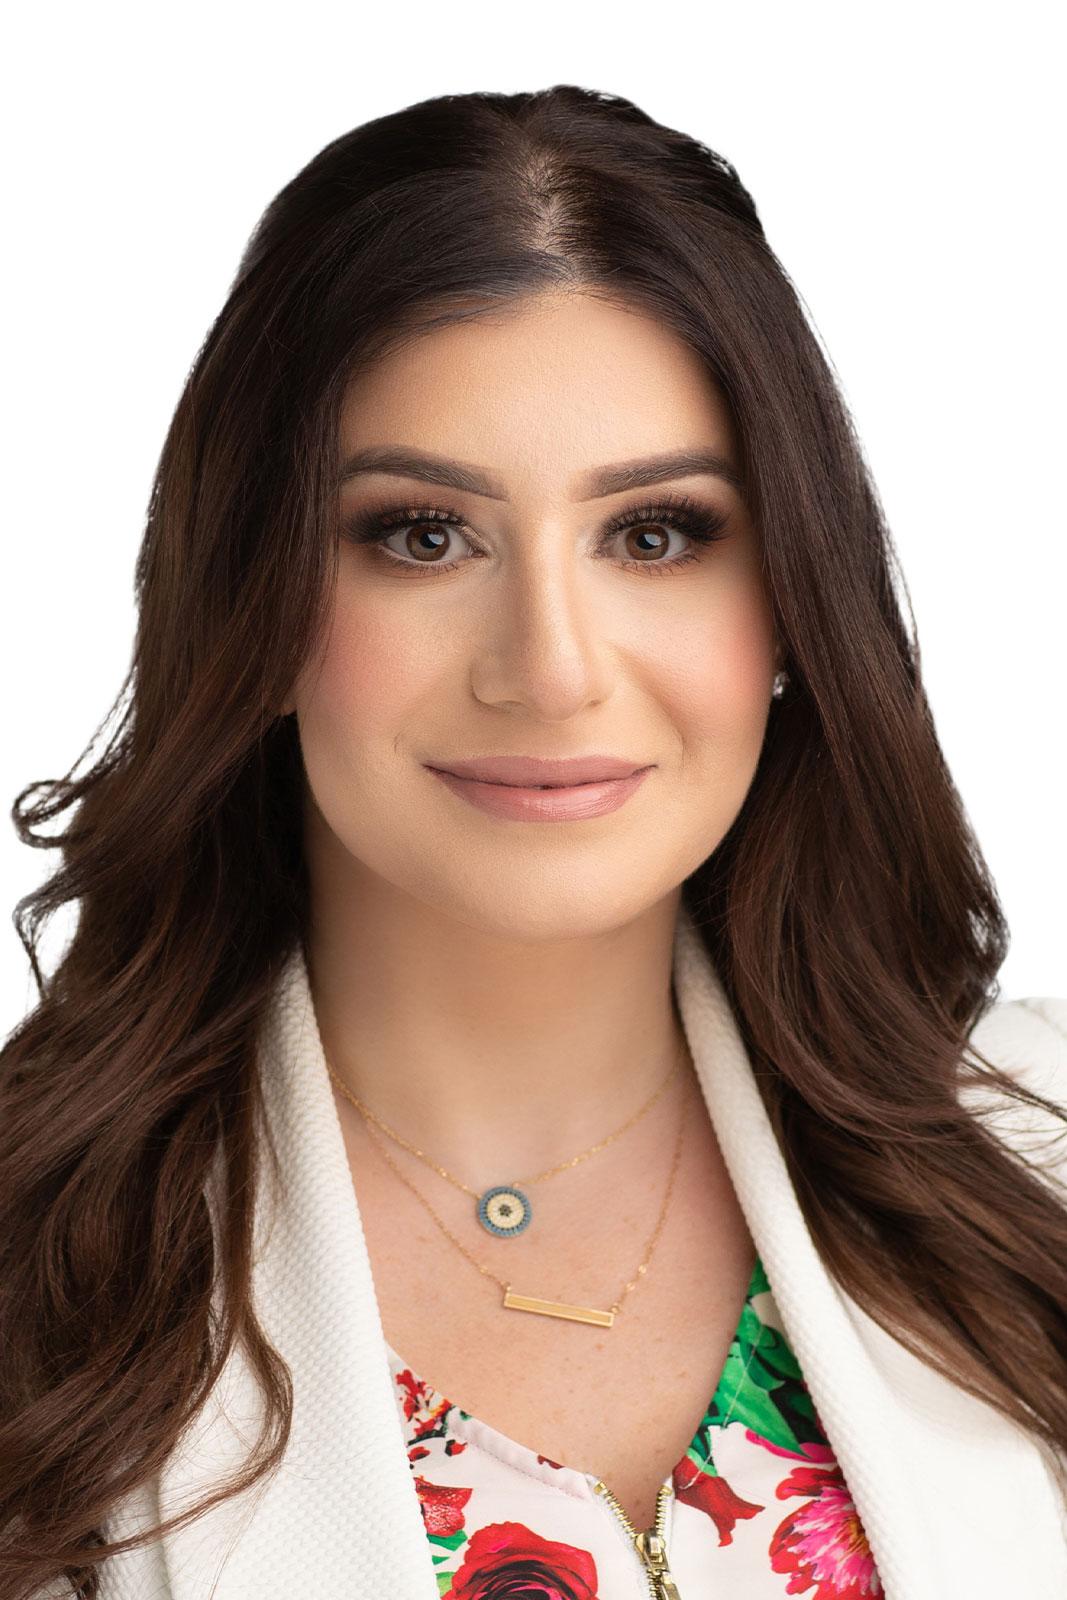 Maysaa Hijazi-Zeitoun